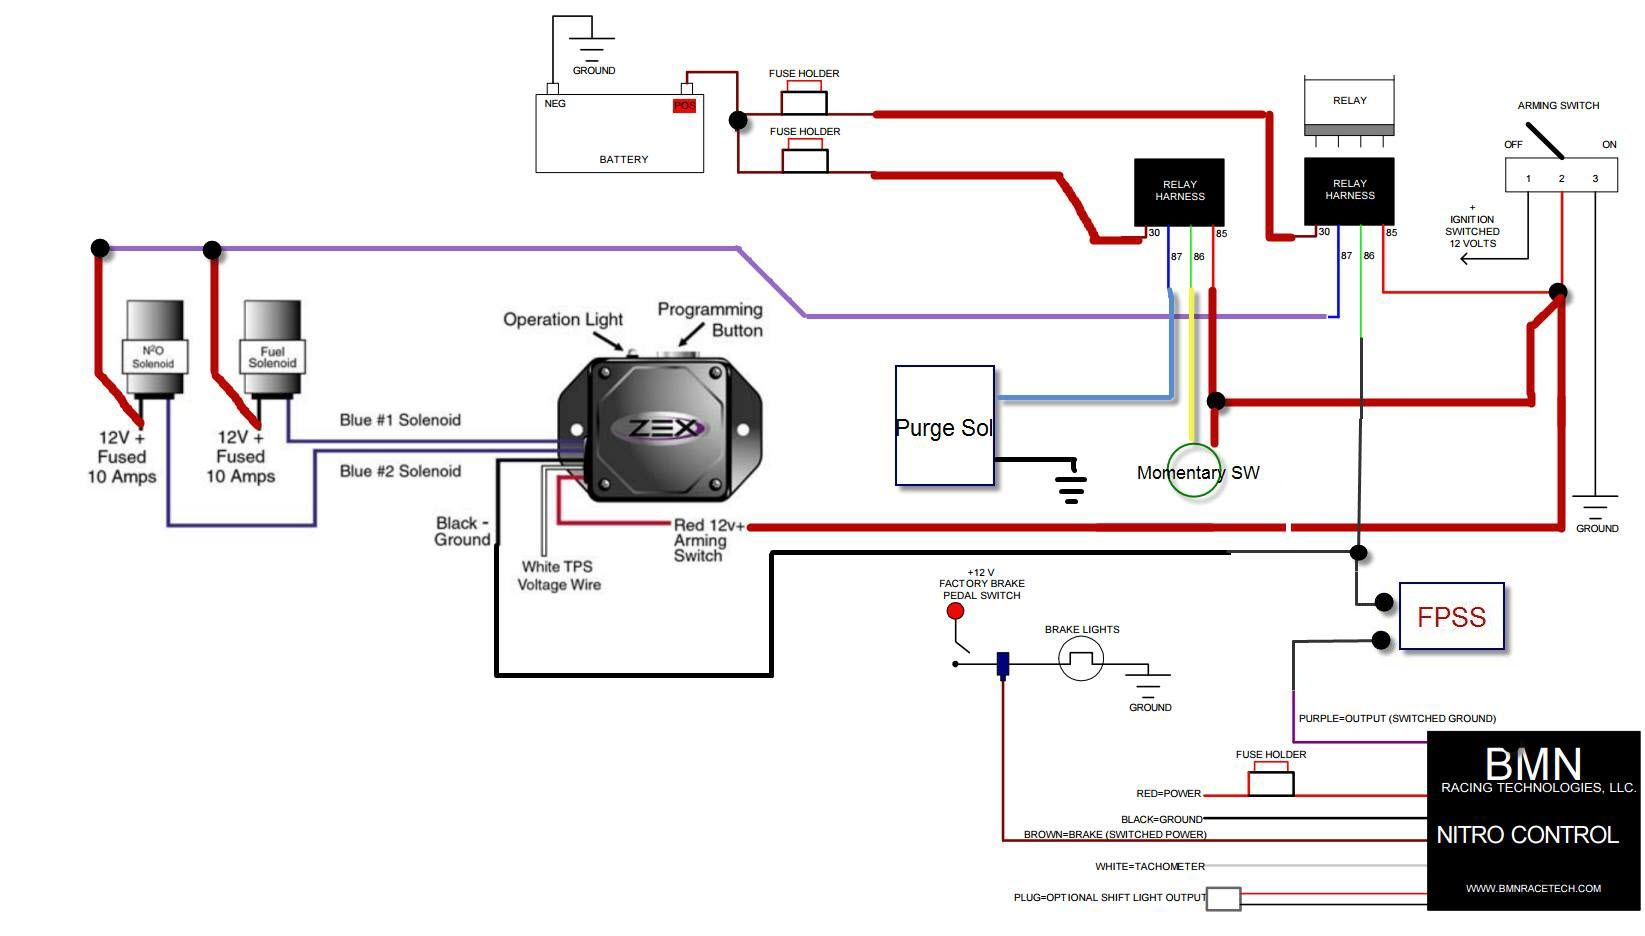 WG_1600] Wiring Diagram Likewise Suzuki Wetbike Wiring Diagram On  Mastercraft Download DiagramXortanet Mecad Cran Ospor Cajos Terst Lline Hisre Opogo Apom Pschts Umize  Dness Xeira Mohammedshrine Librar Wiring 101